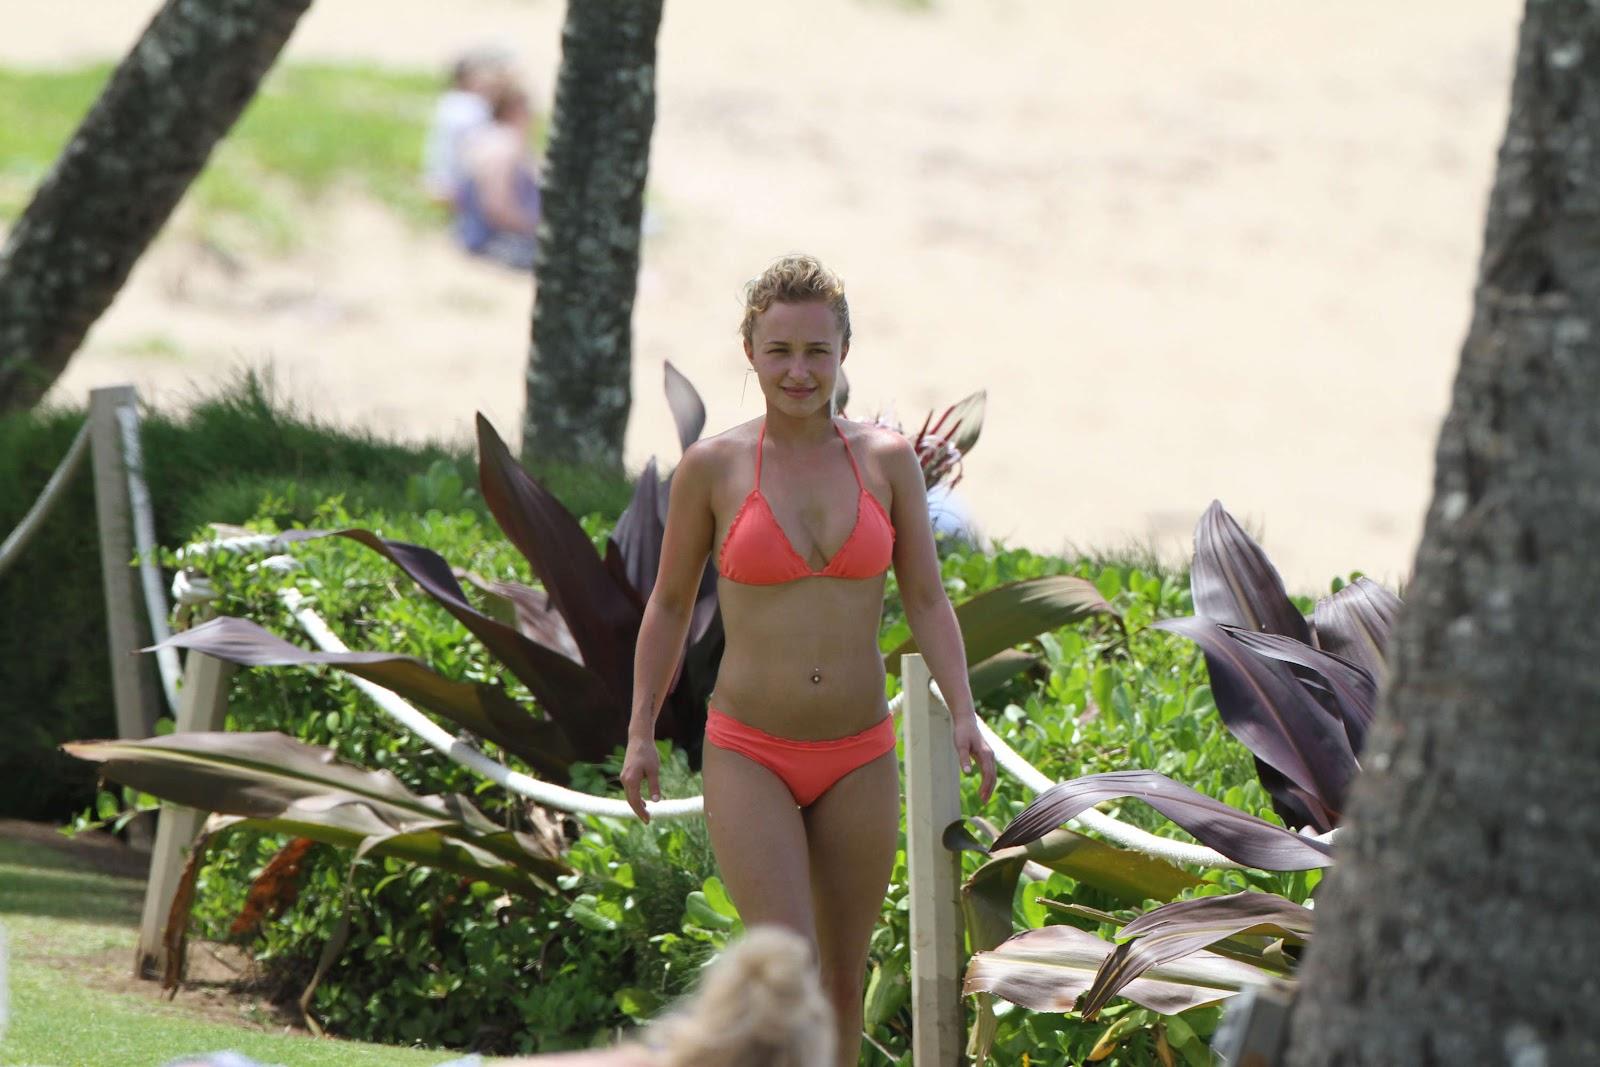 http://4.bp.blogspot.com/-YLXR0VhUjzU/T4nilCTWkhI/AAAAAAAAAKw/qYq-rbNjB3w/s1600/Hayden_Panettiere_hot_orange_bikini_+Hawaii_picture-01.jpg